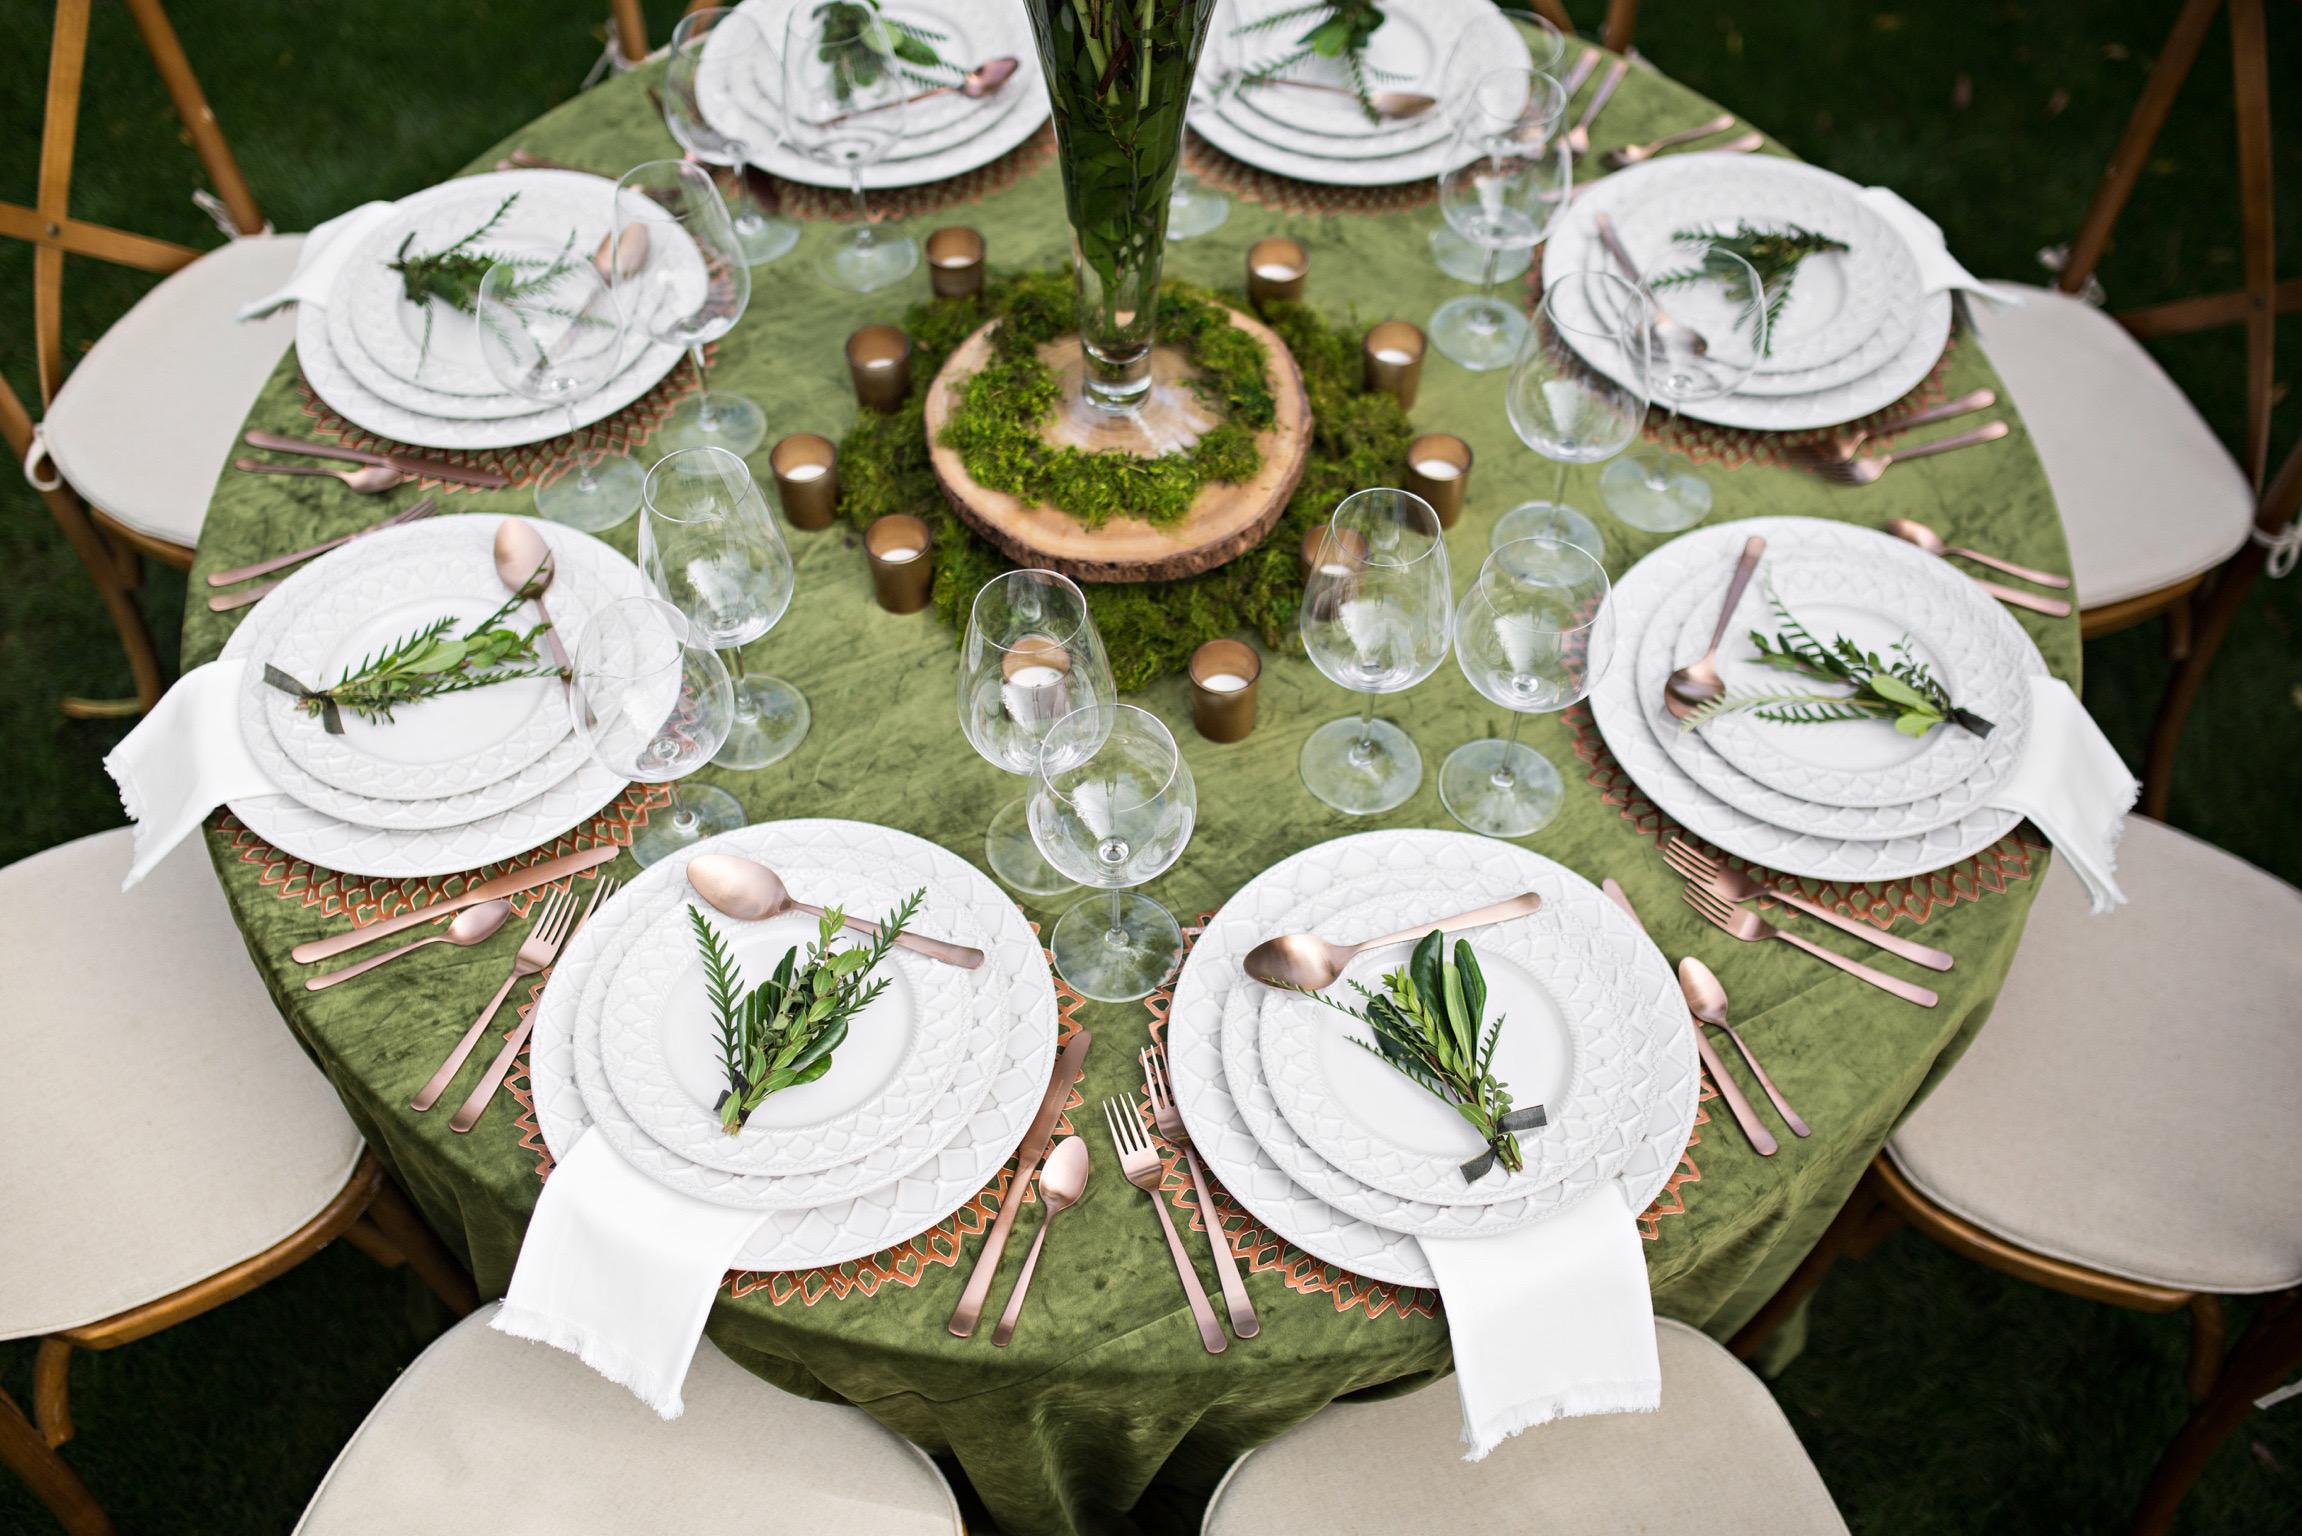 St. Patrick's Dinner Party